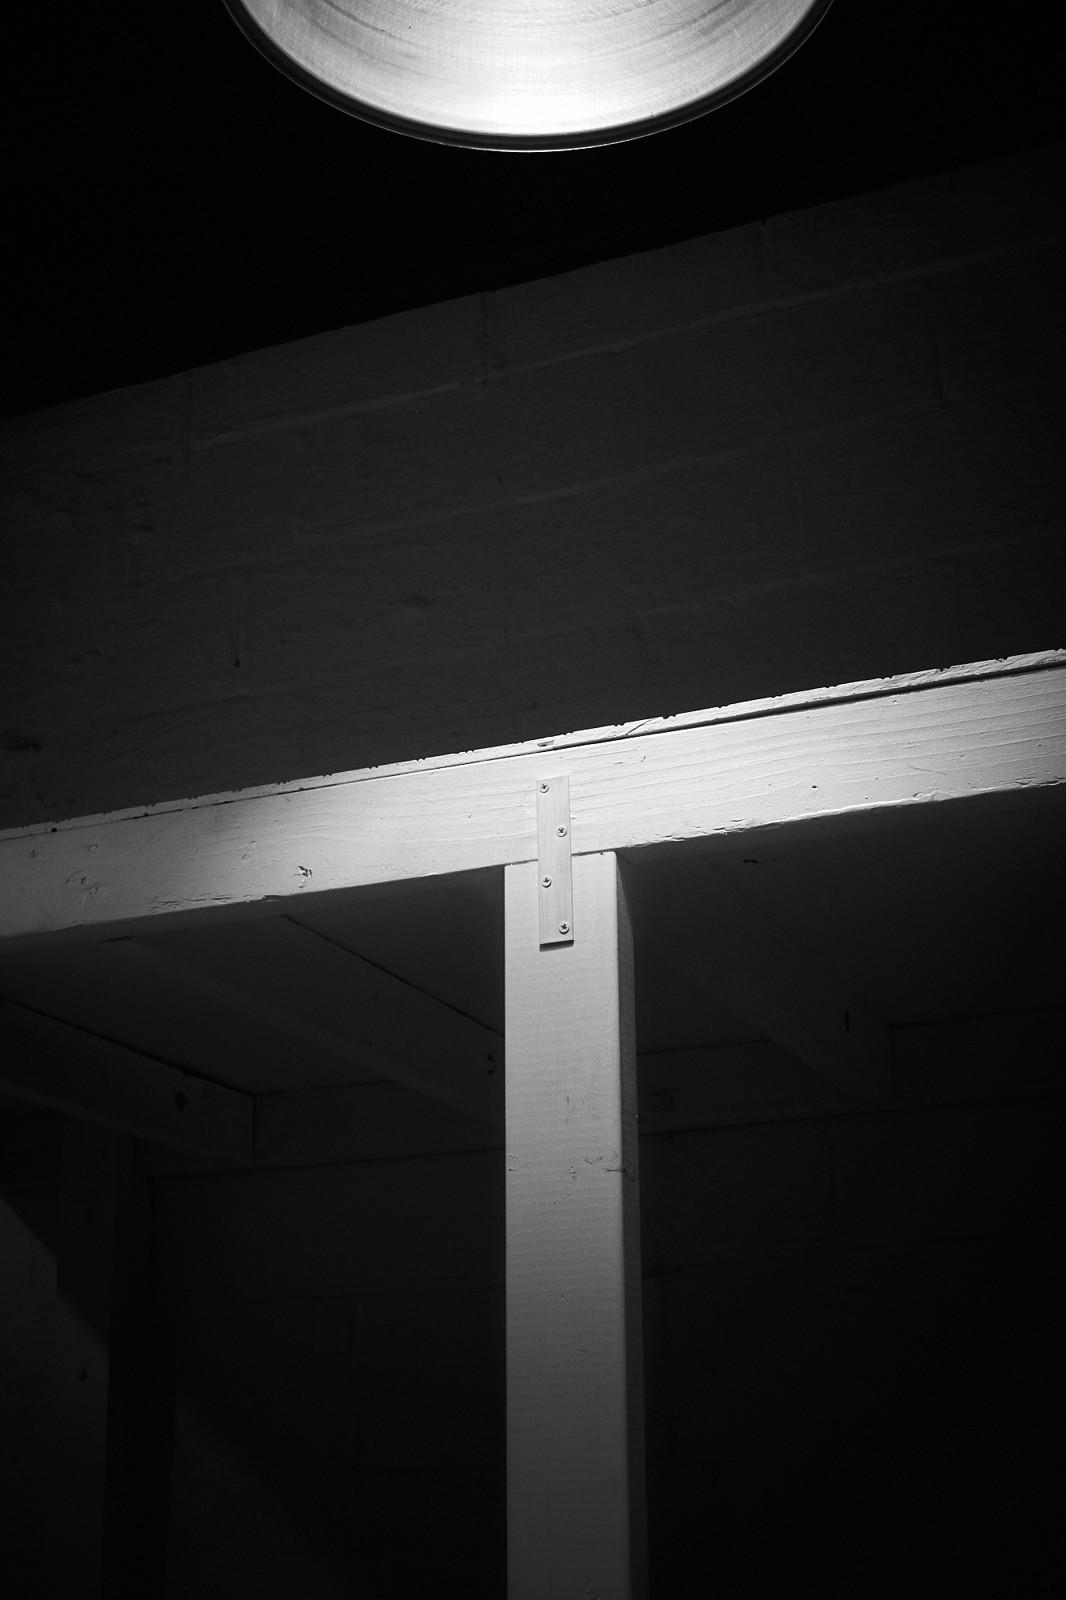 Black & White Fine Art Photography, Harrisburg, Pennsylvania